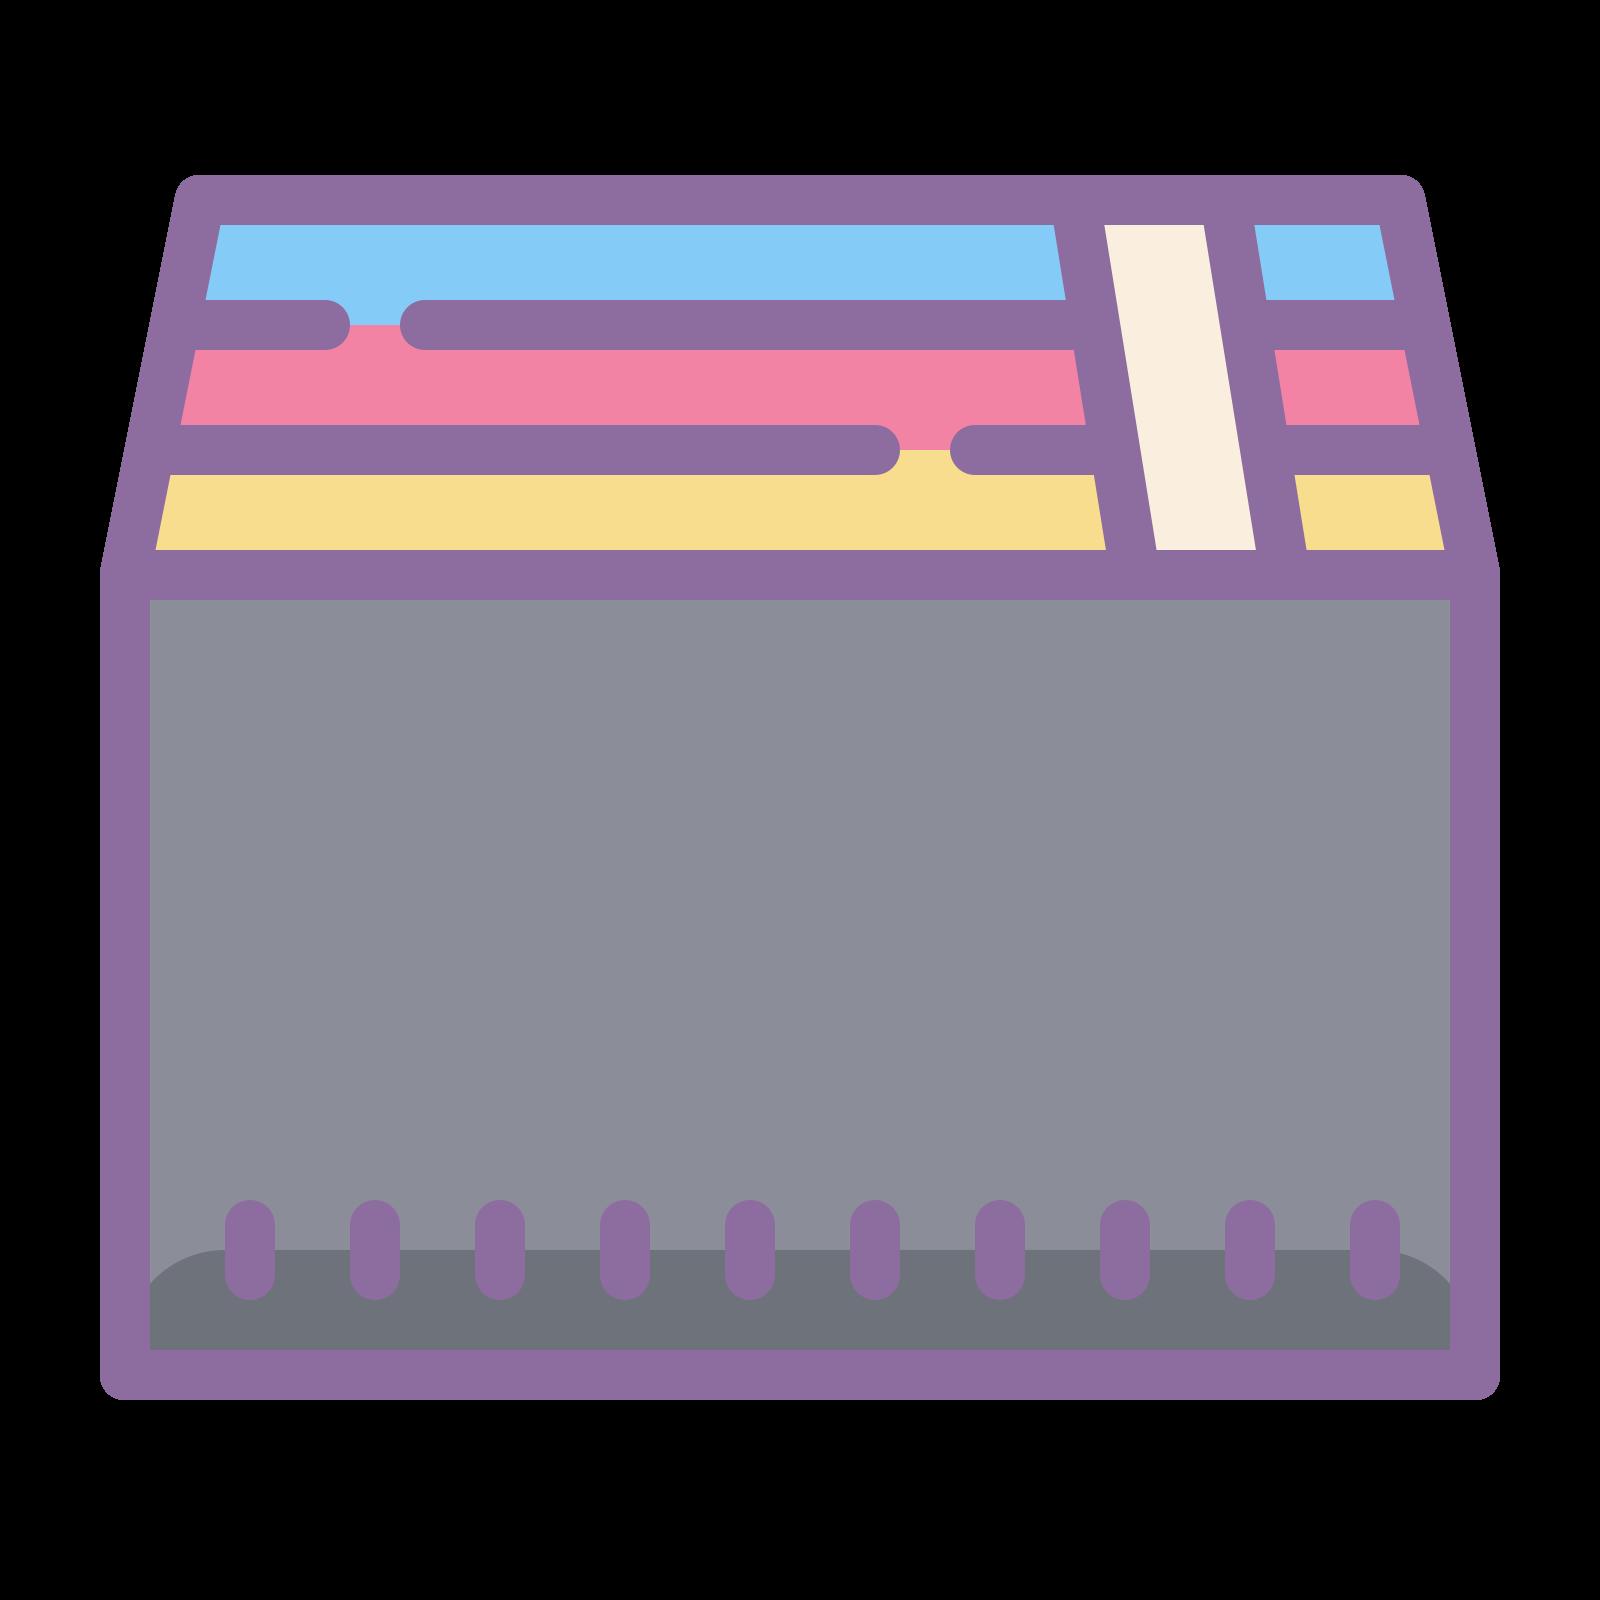 Laser Cartridge icon